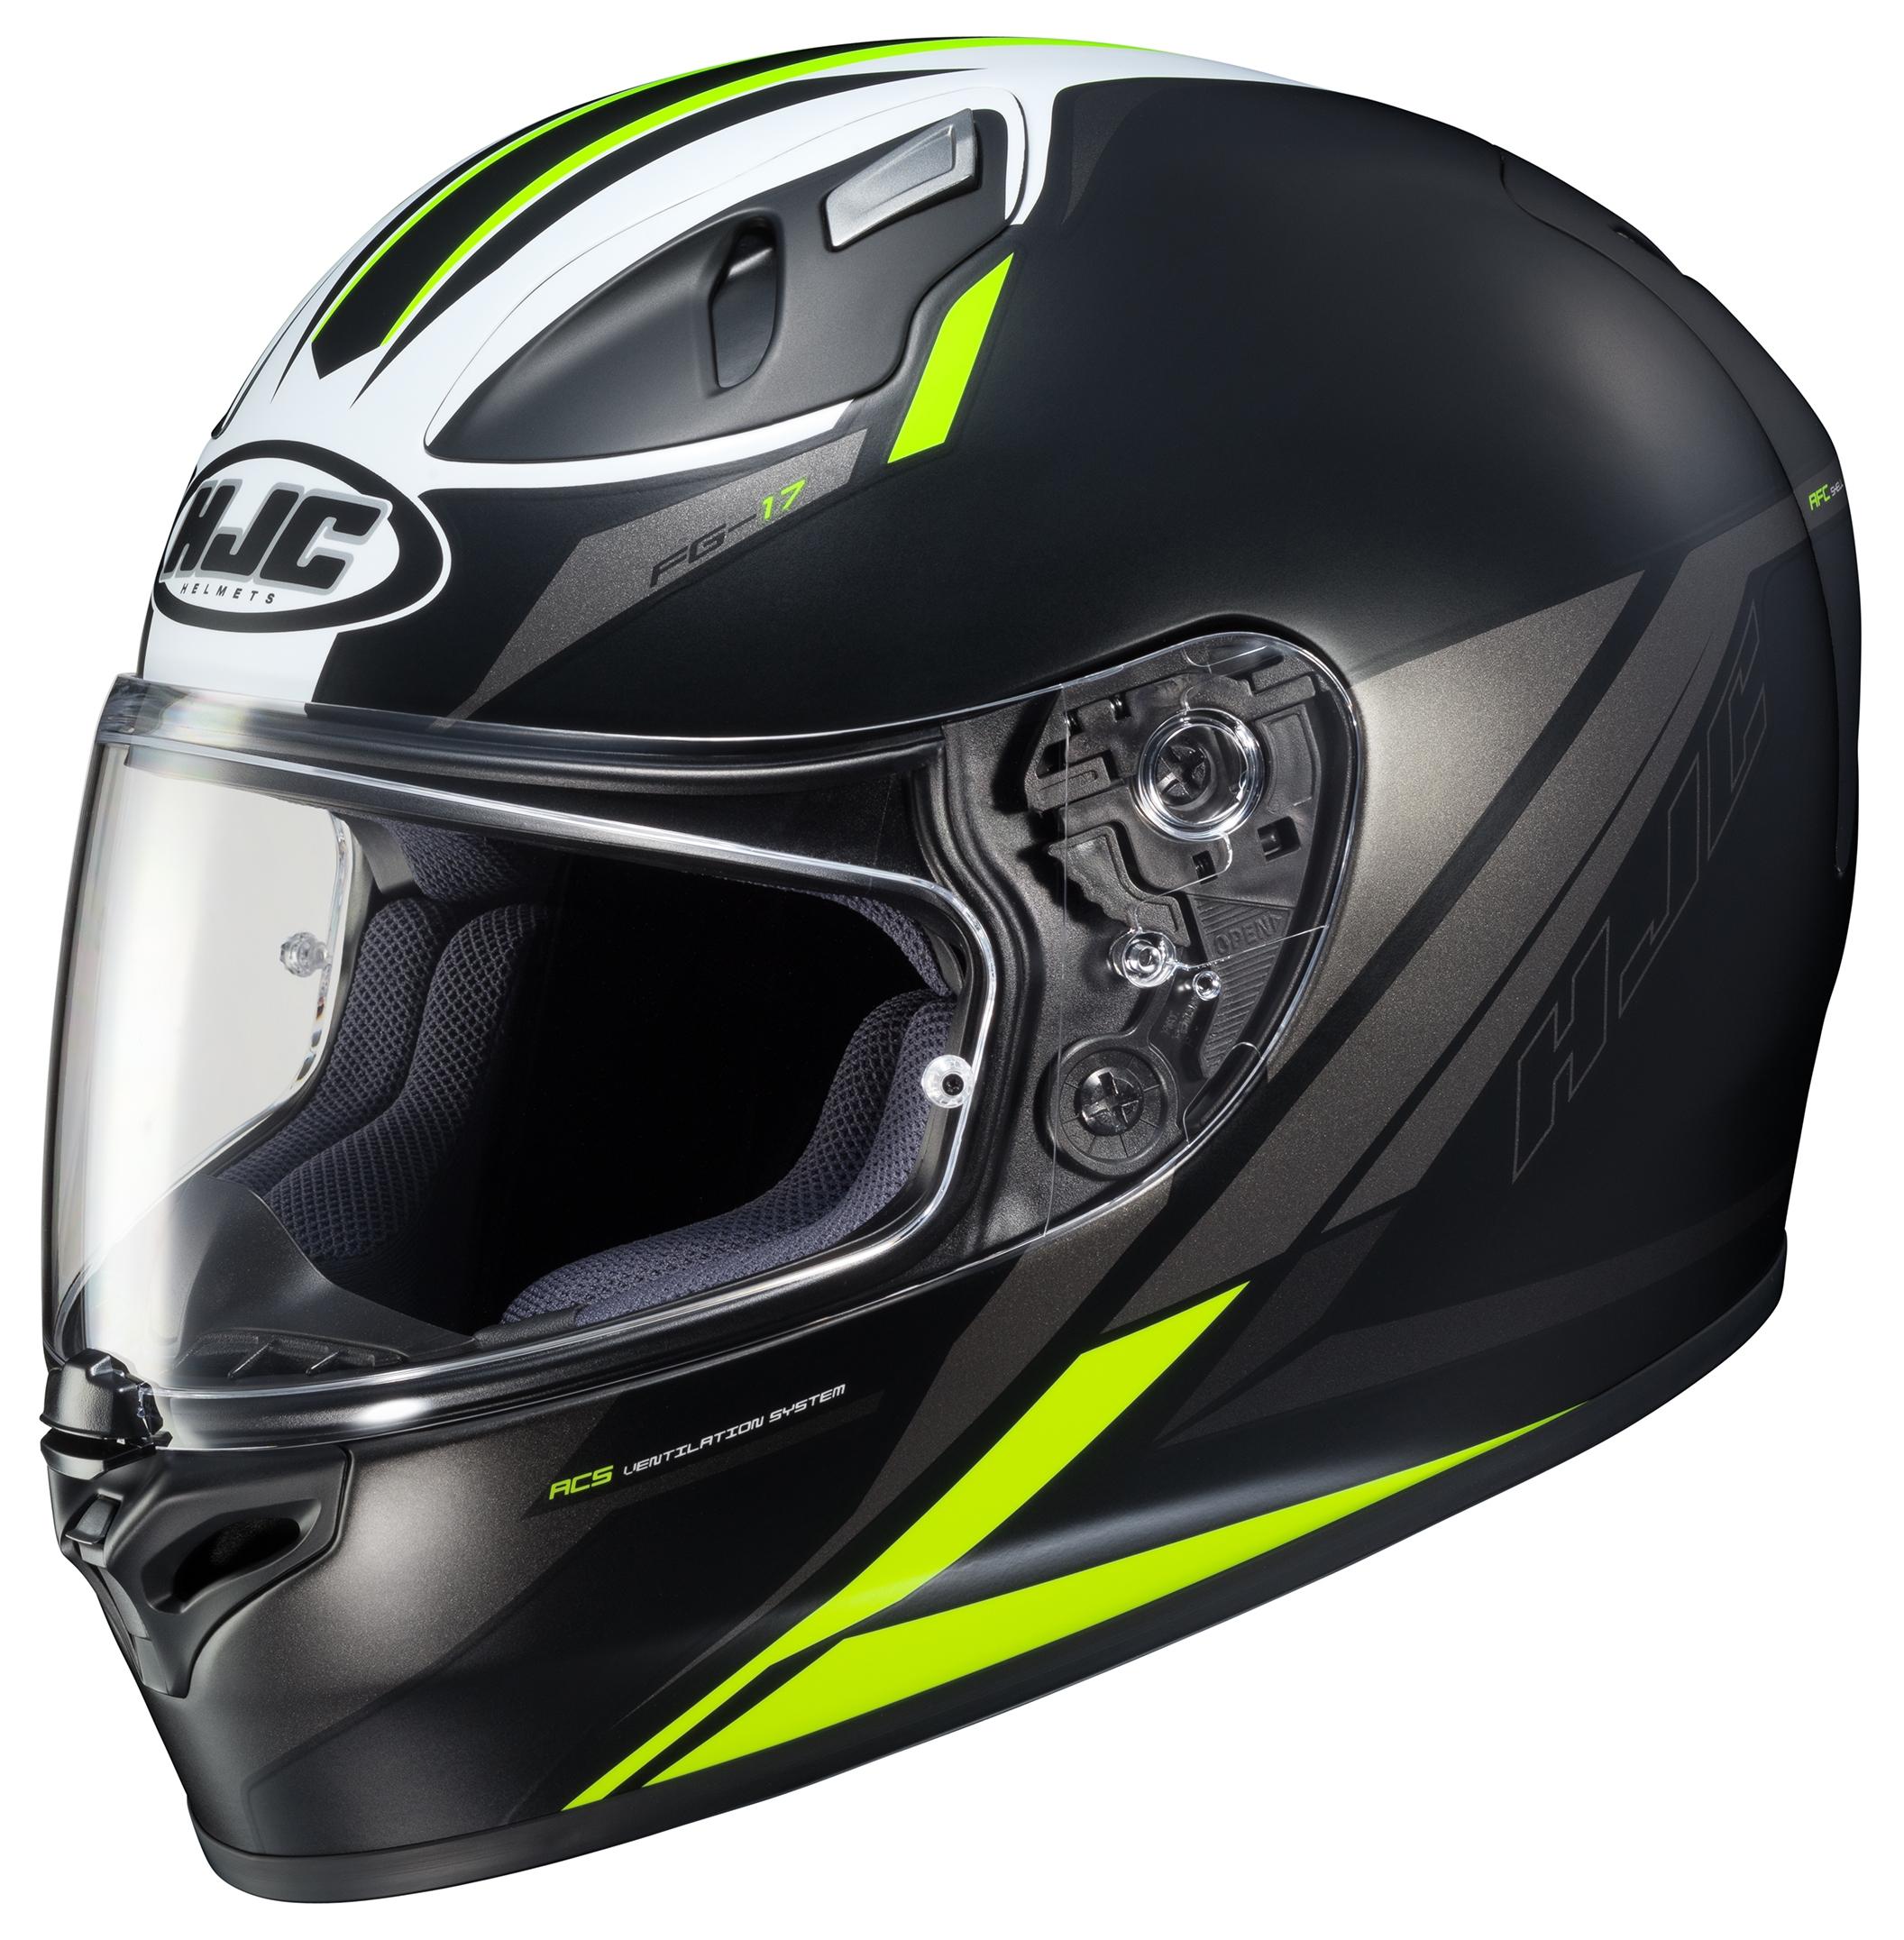 Hjc Fg 17 >> Hjc Fg 17 Valve Helmet Cycle Gear